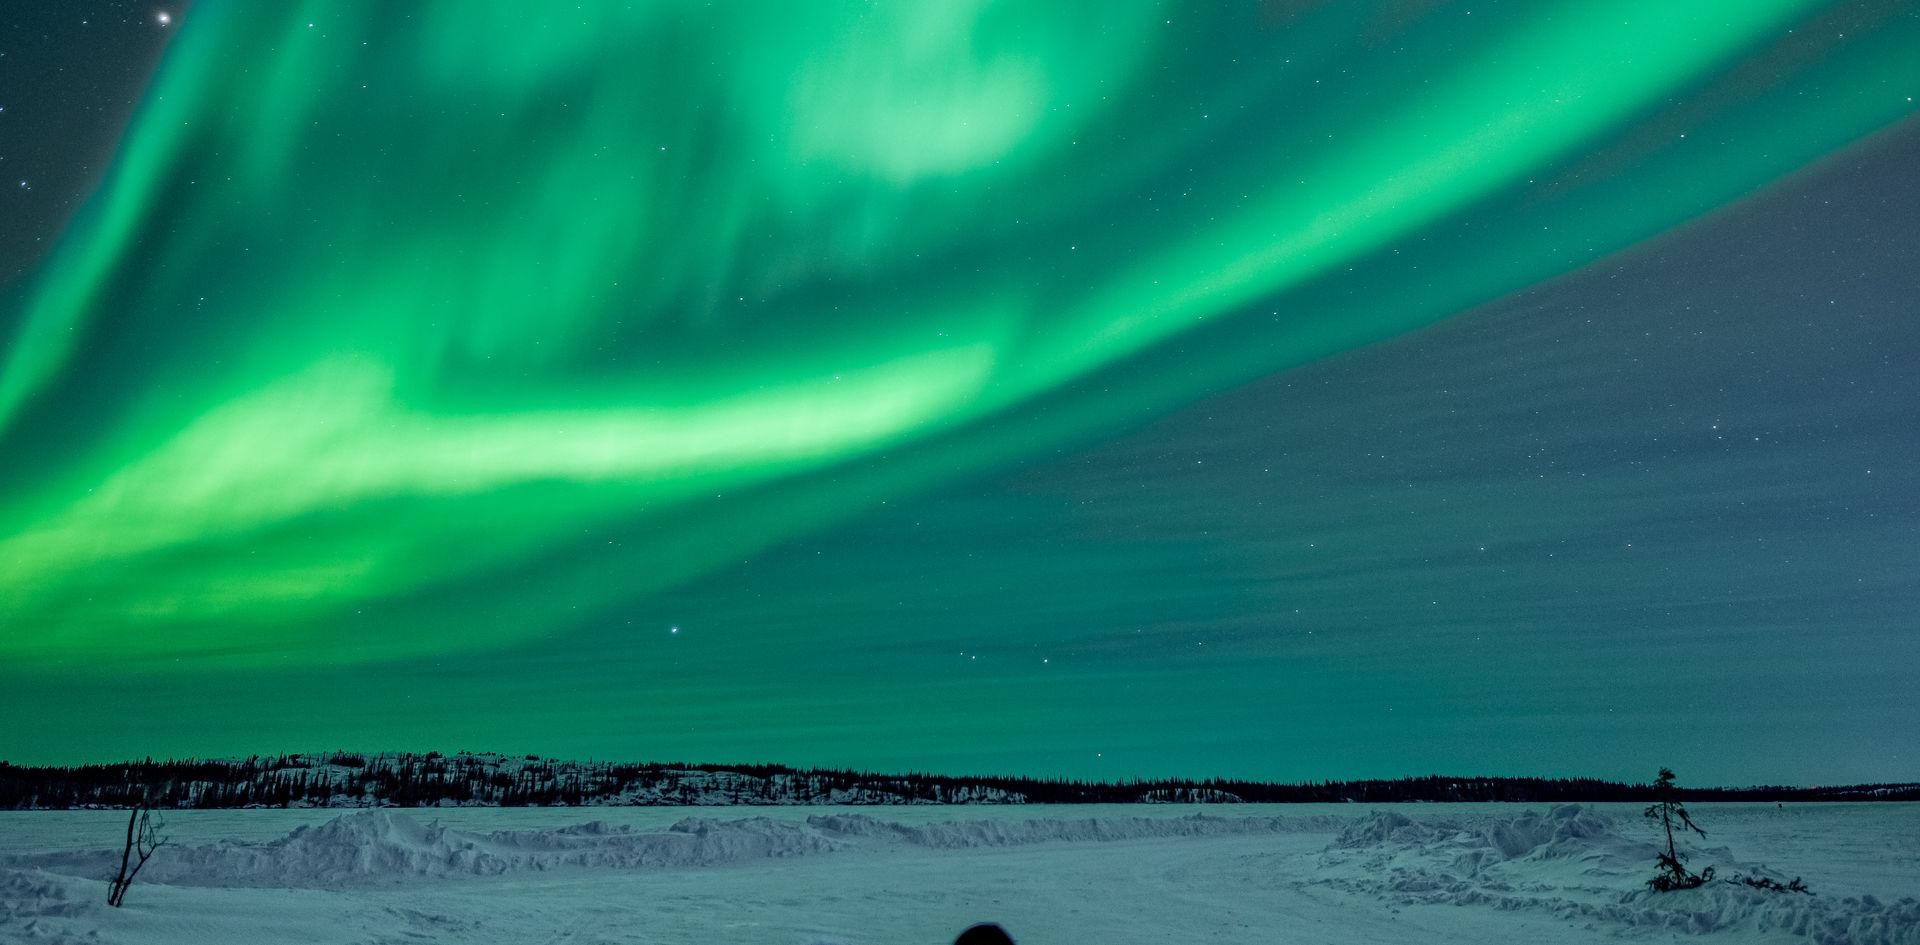 Enjoy the aurora views